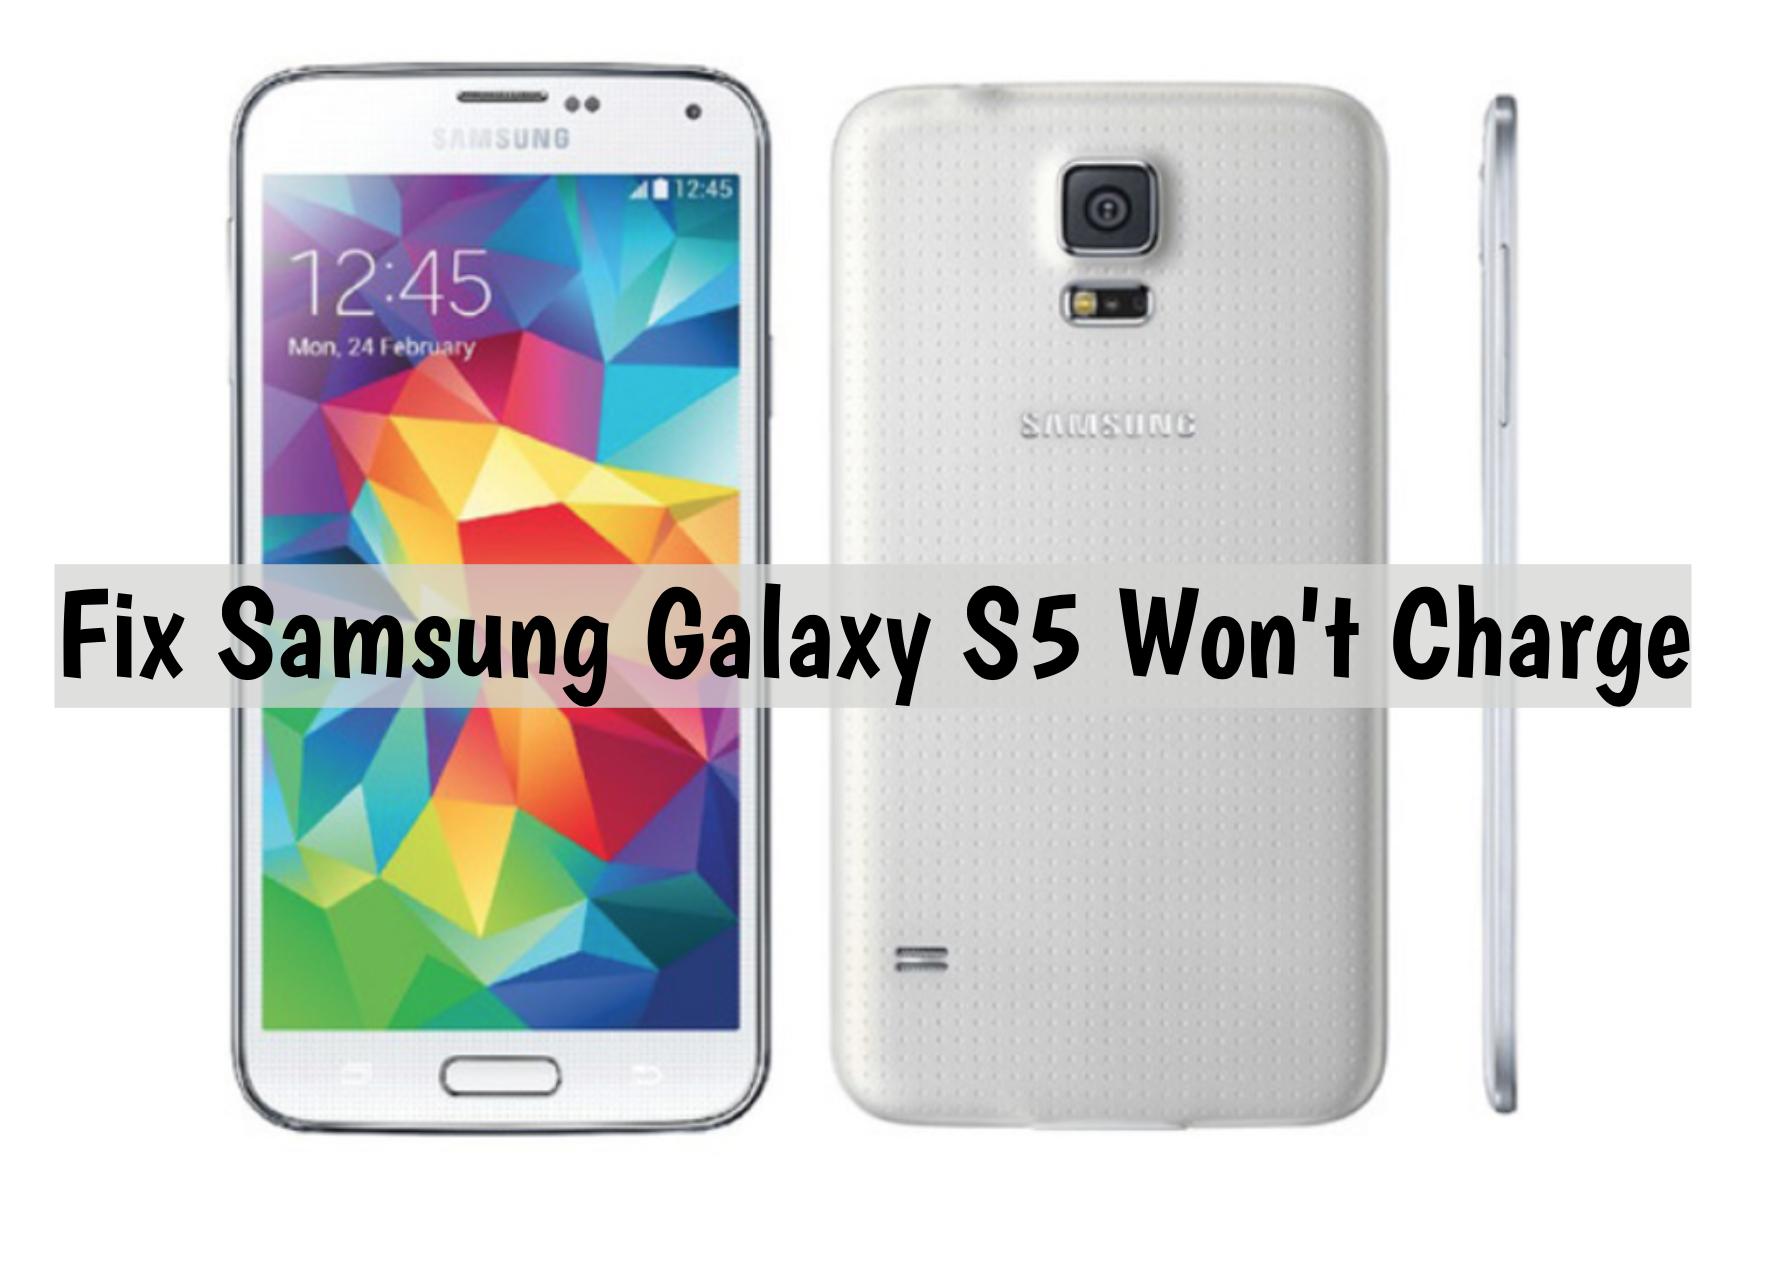 Samsung Galaxy S5 Won't Charge